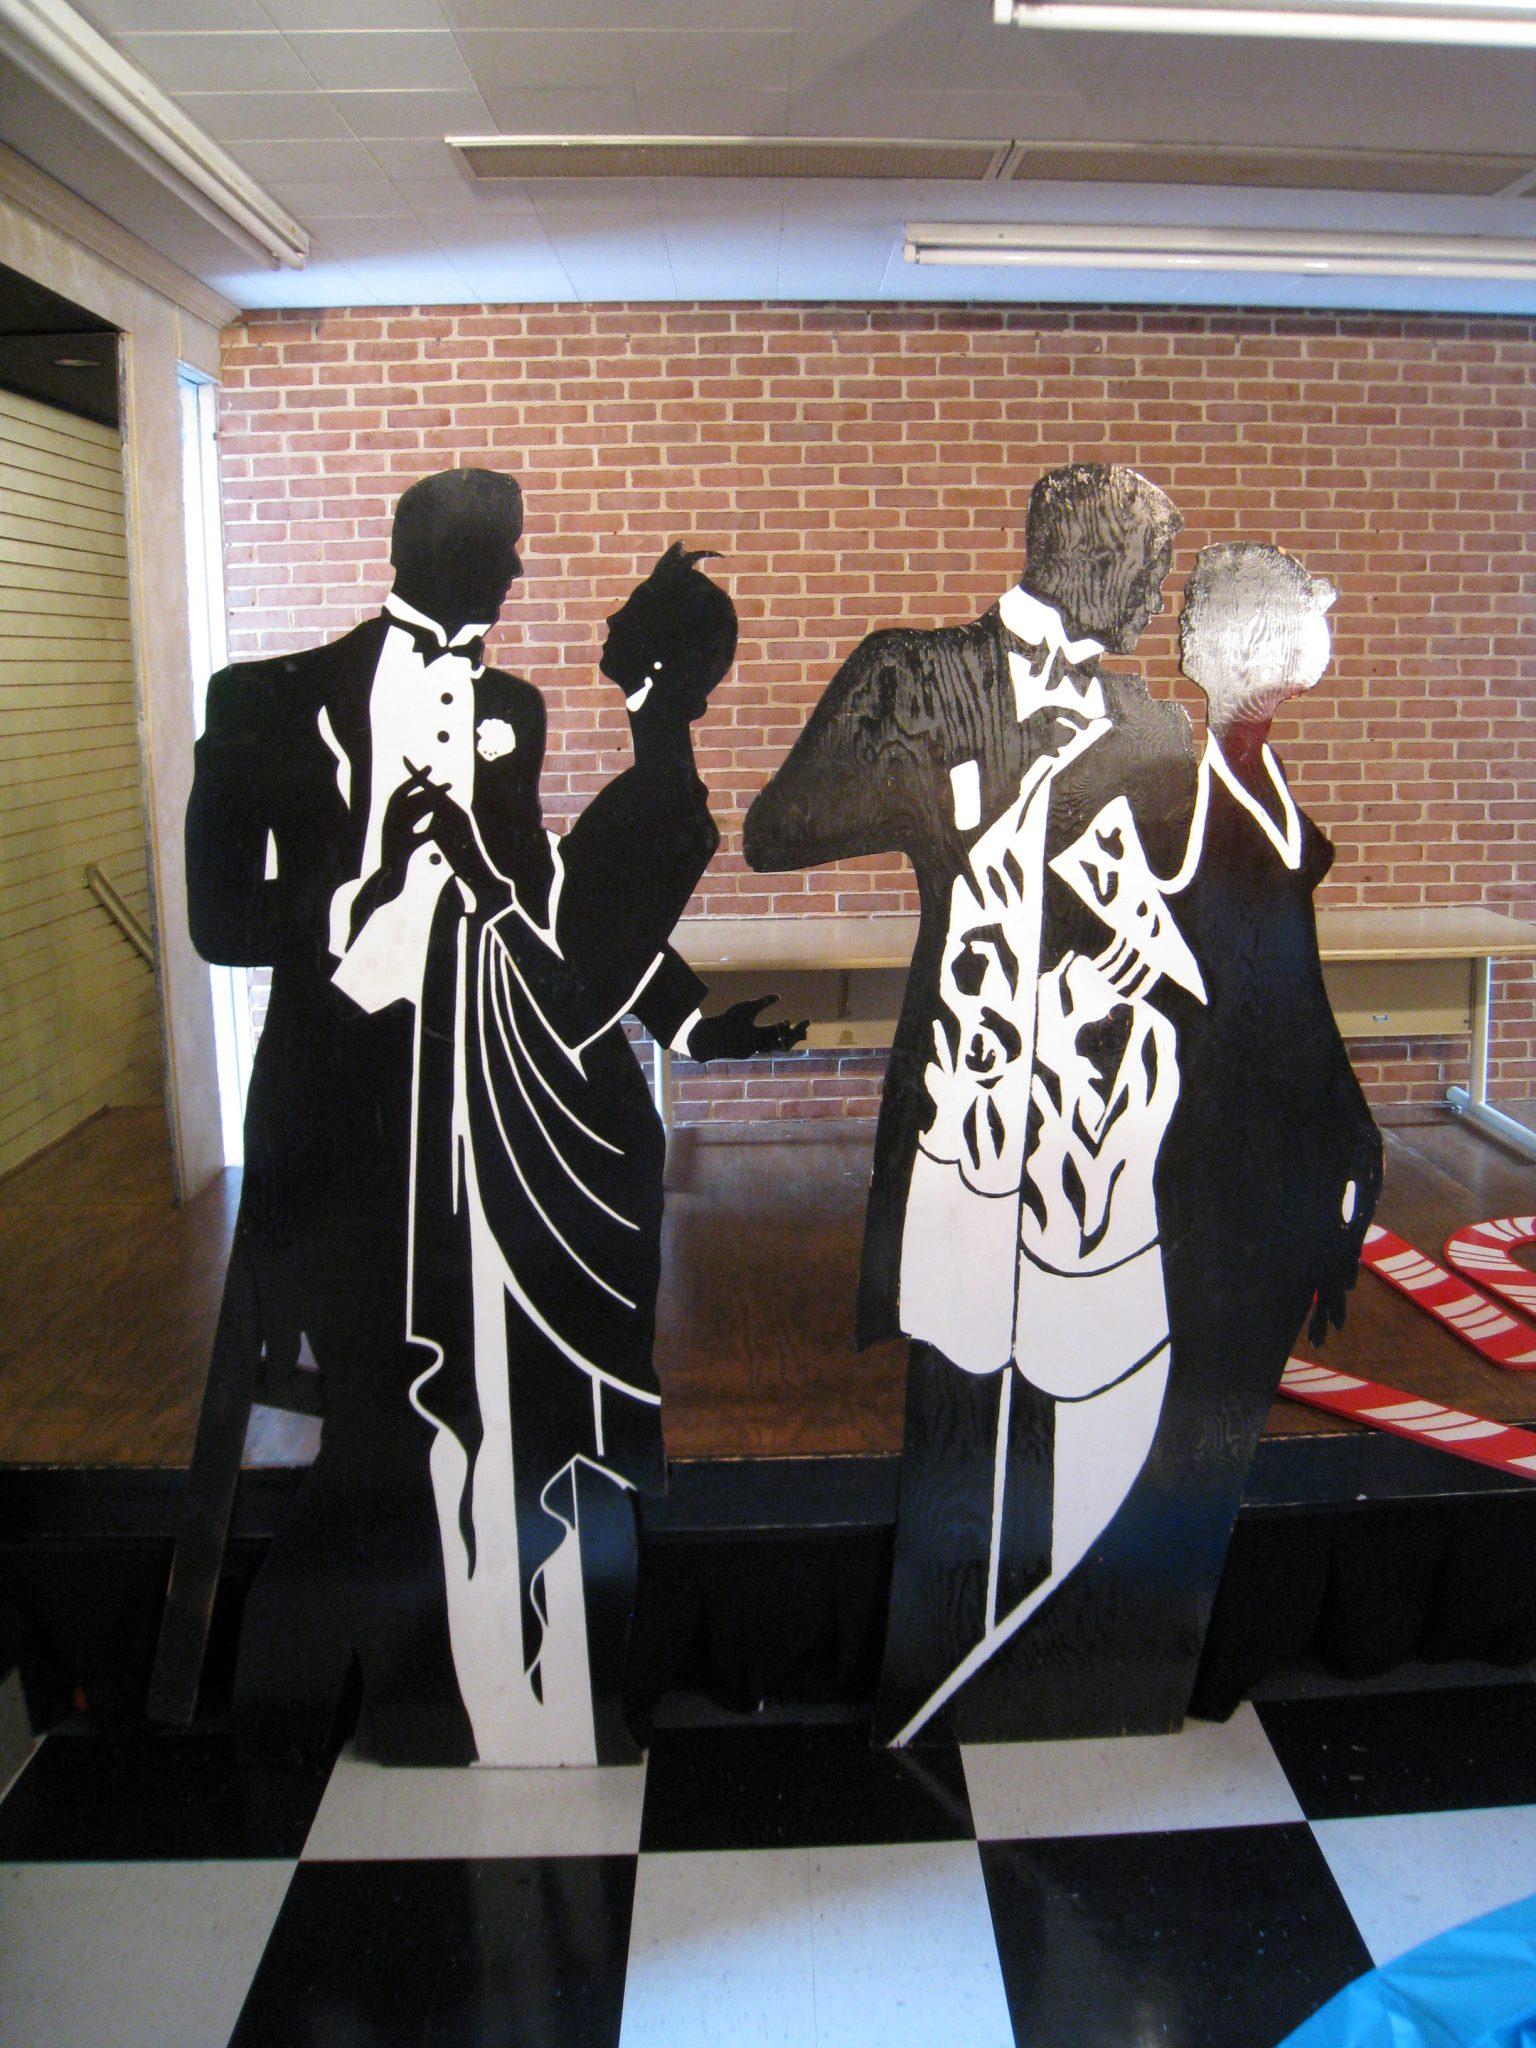 Retro, Black & White Art Deco – Baltimore's Best Events